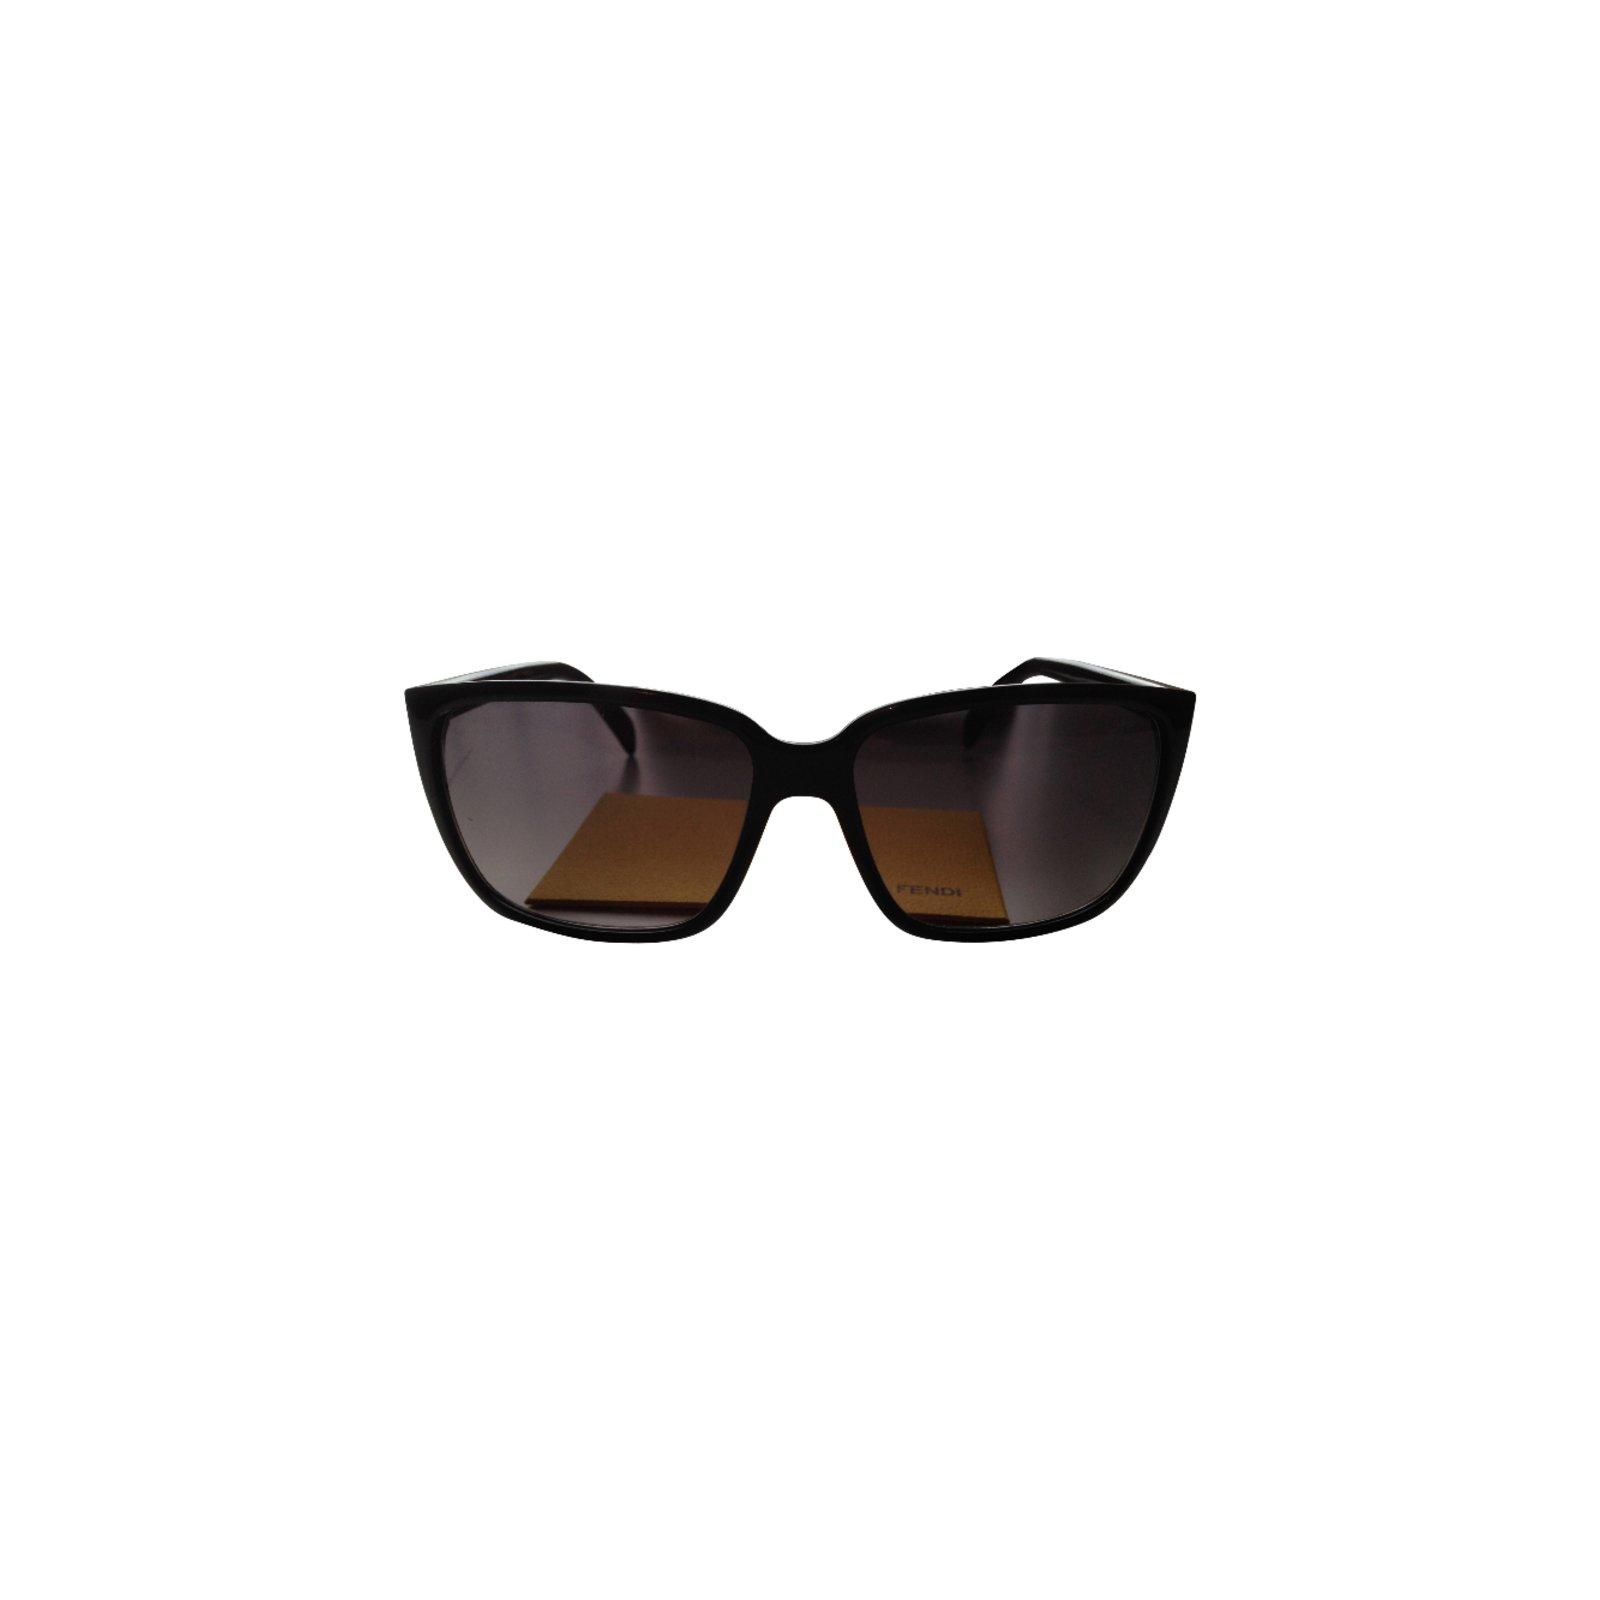 3f74bf17d6 Fendi Sunglasses Sunglasses Plastic Black ref.37649 - Joli Closet